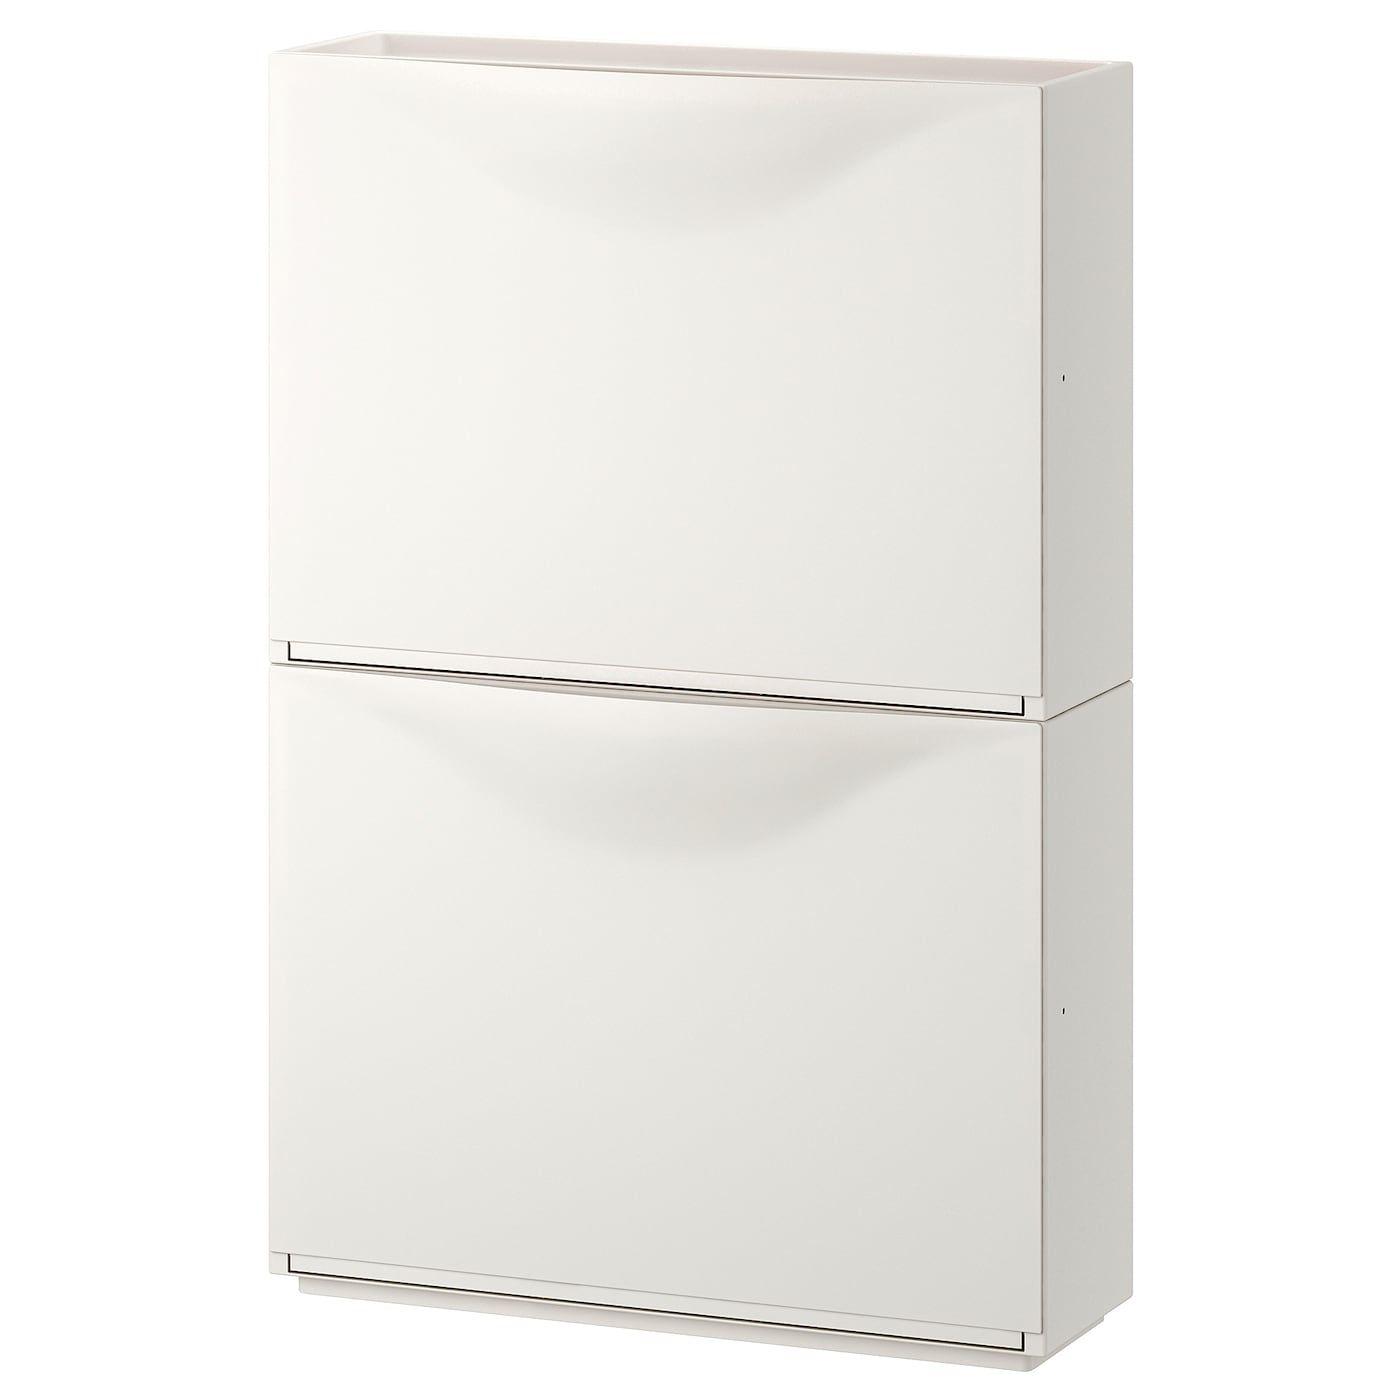 IKEA - TRONES Shoe/storage cabinet, White TRONES S